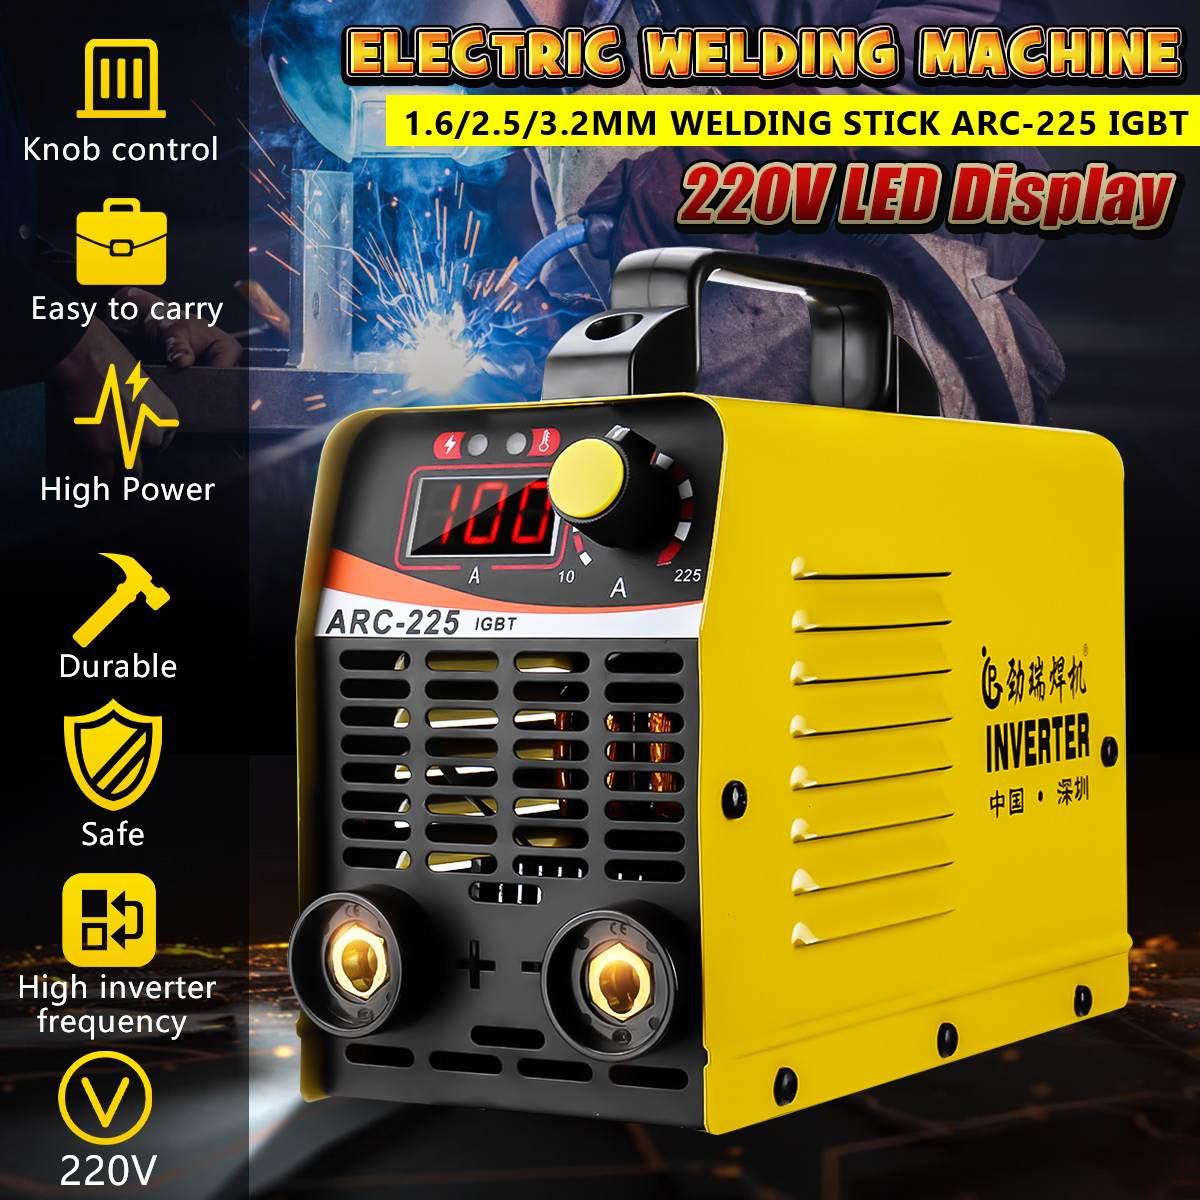 10-225A ARC-225 25KVA Handheld Mini MMA IGBT Inverter 220V Mini Electric ARC Welding Welder Inverter Machine Tool